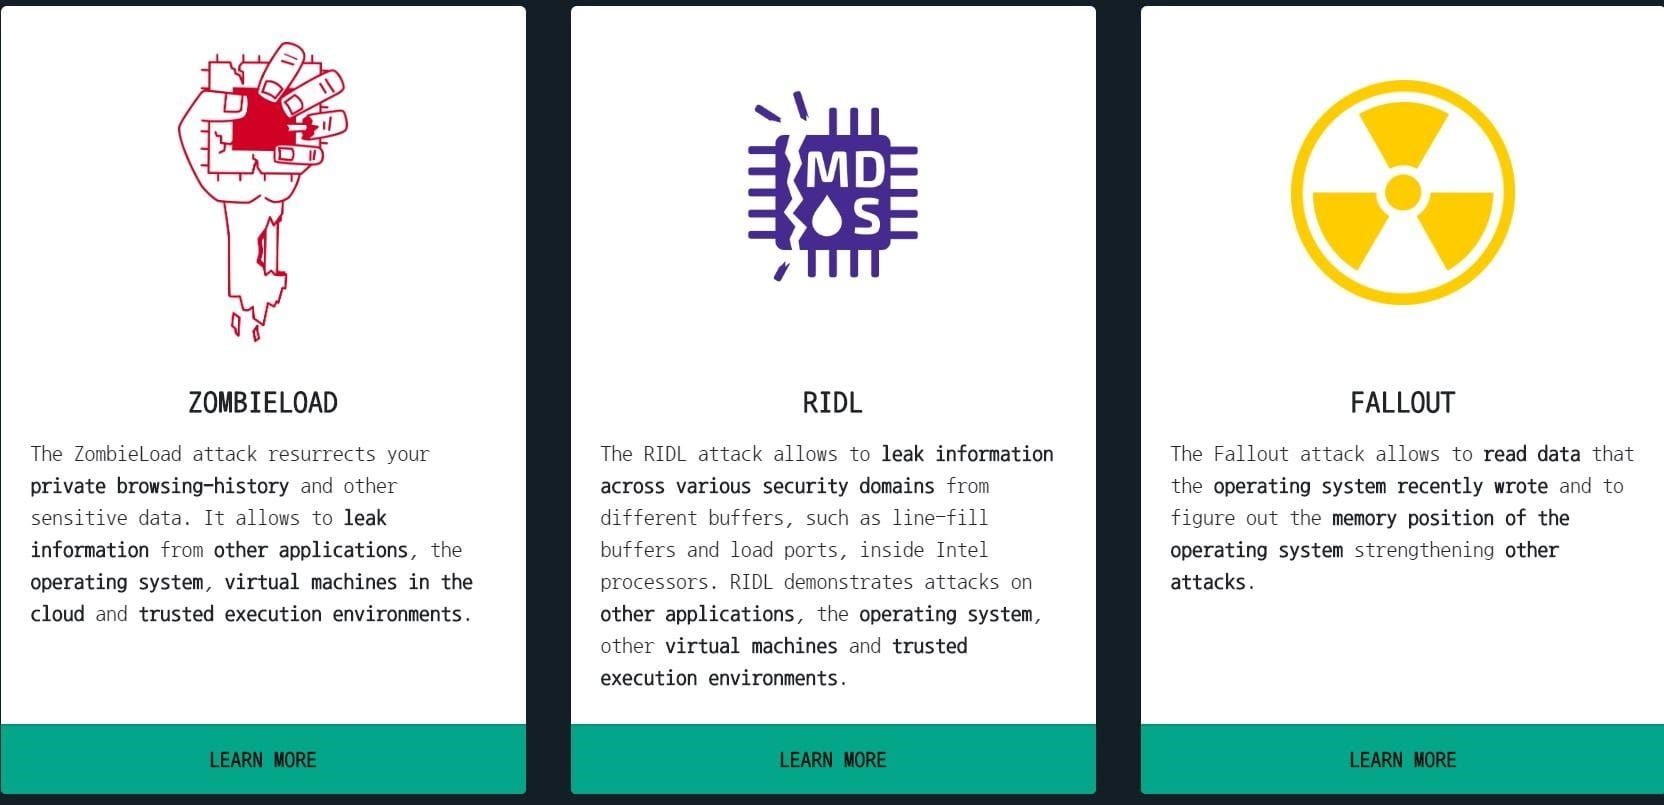 Microarchitectural Data Sampling attack